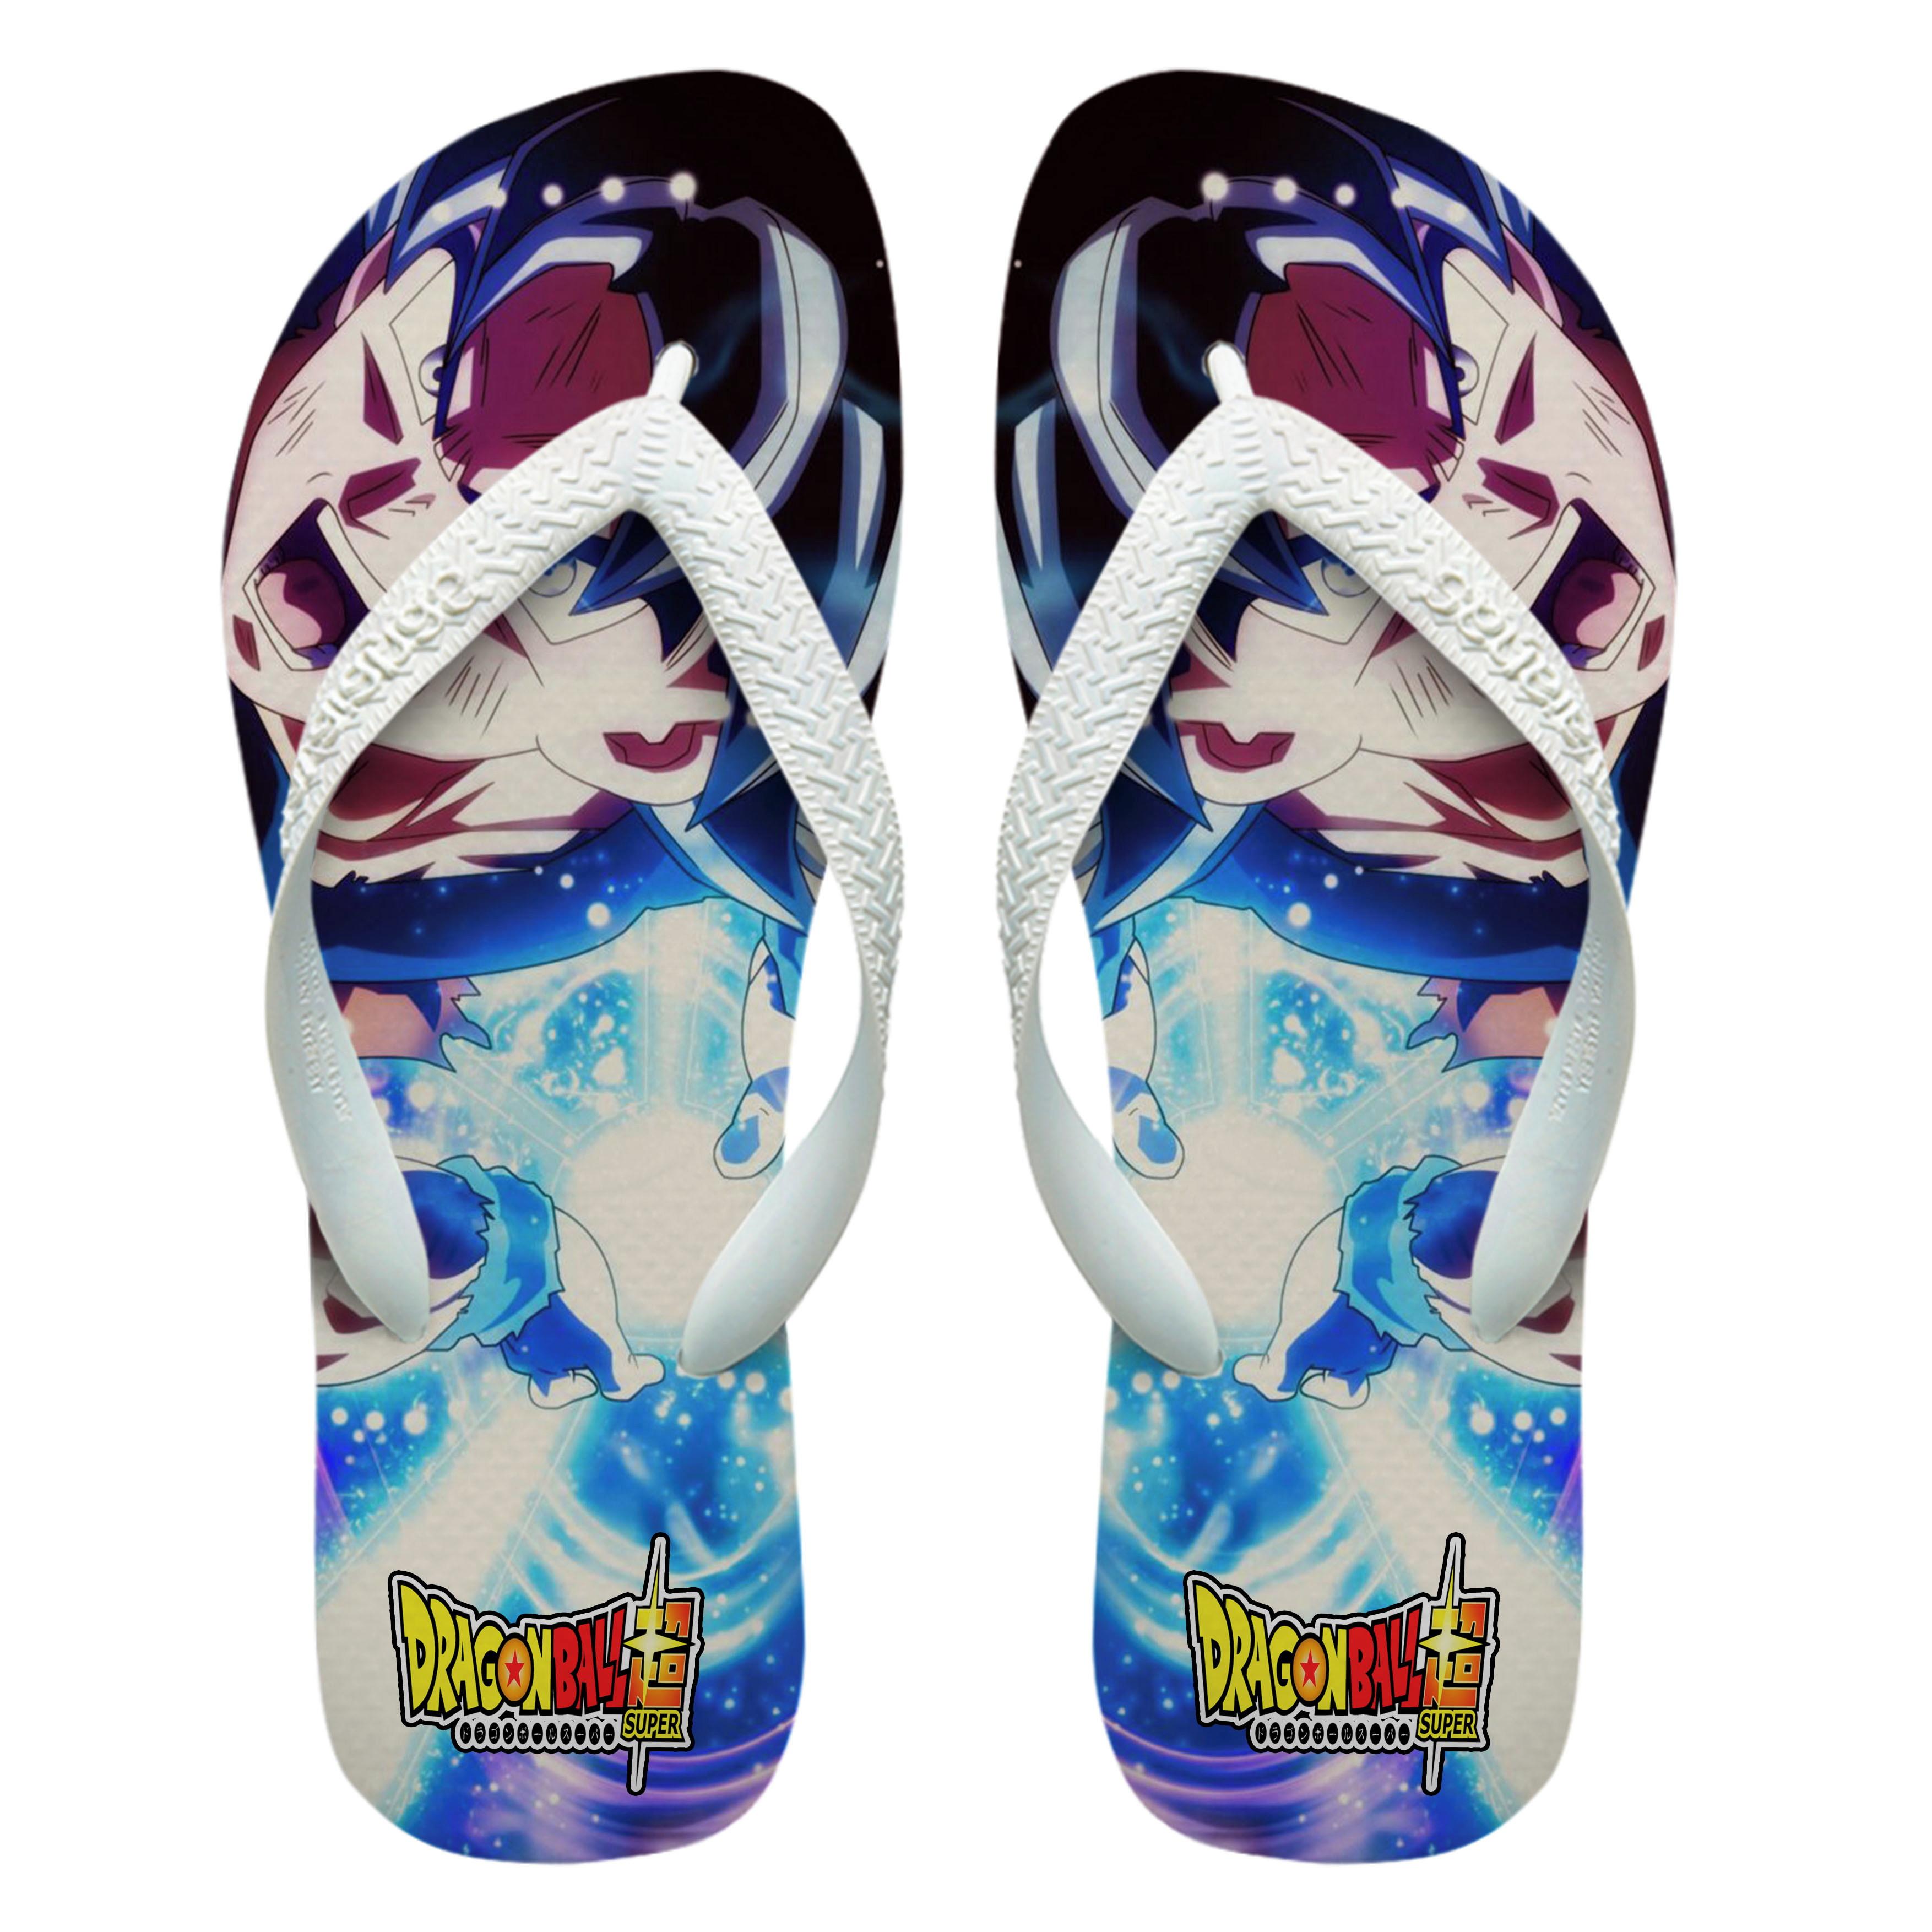 998e392a04577a Chinelos Personalizados Havaianas Dragon Ball Goku [7]